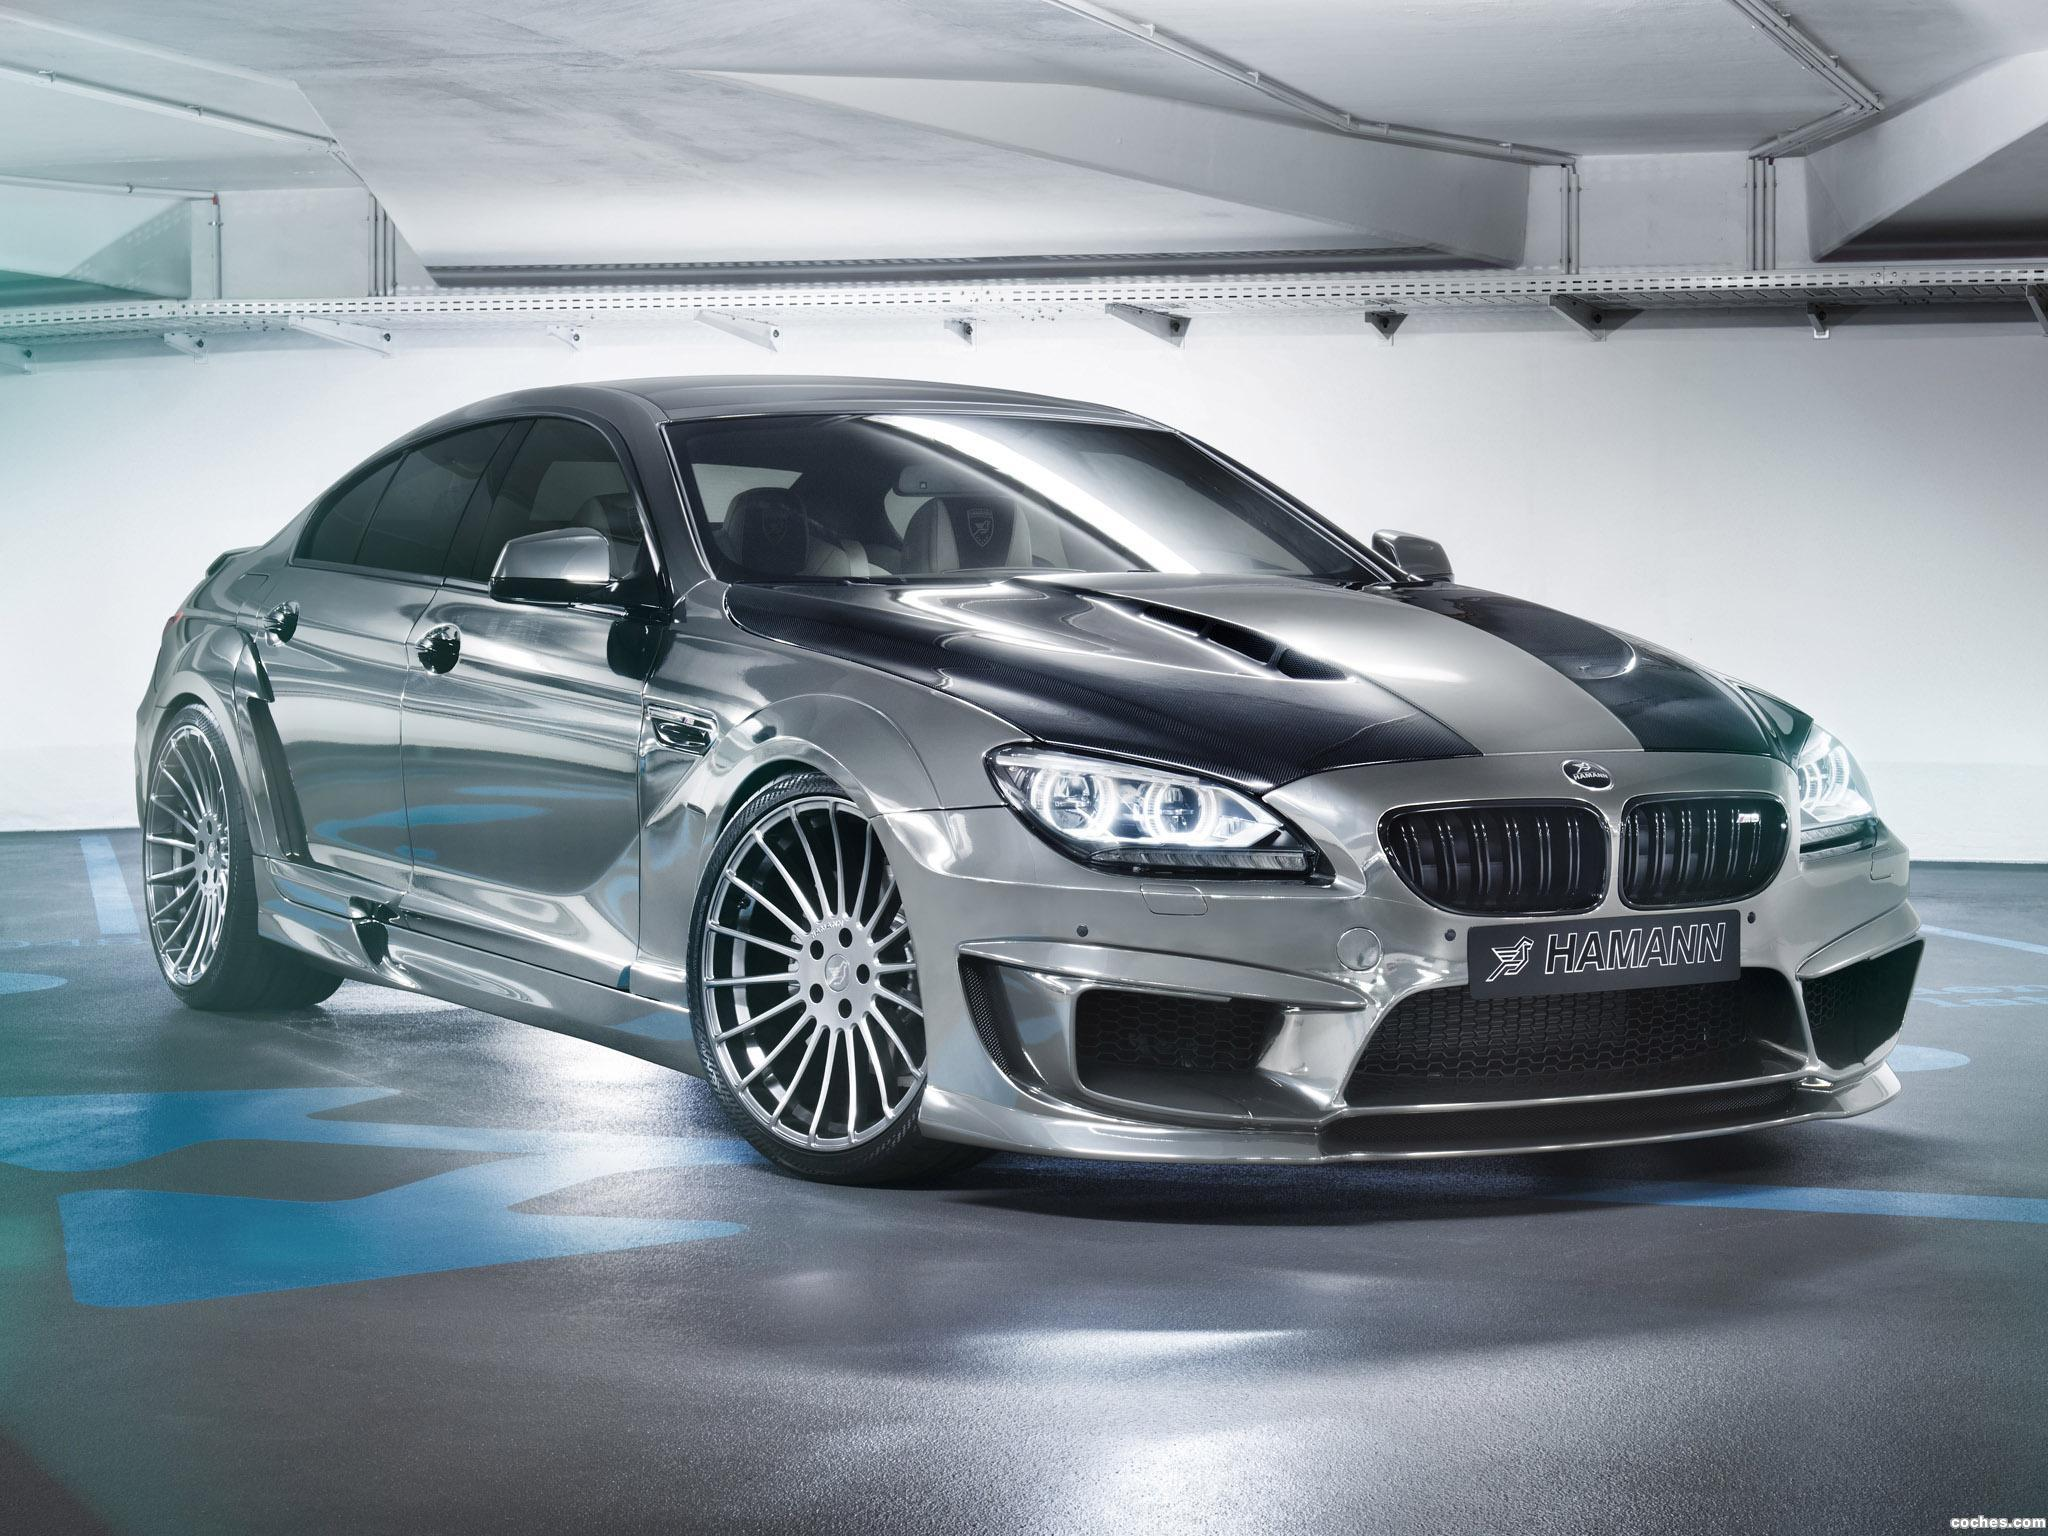 Foto 0 de BMW Hamann Serie 6 Gran Coupe Mirr6r F06 2013